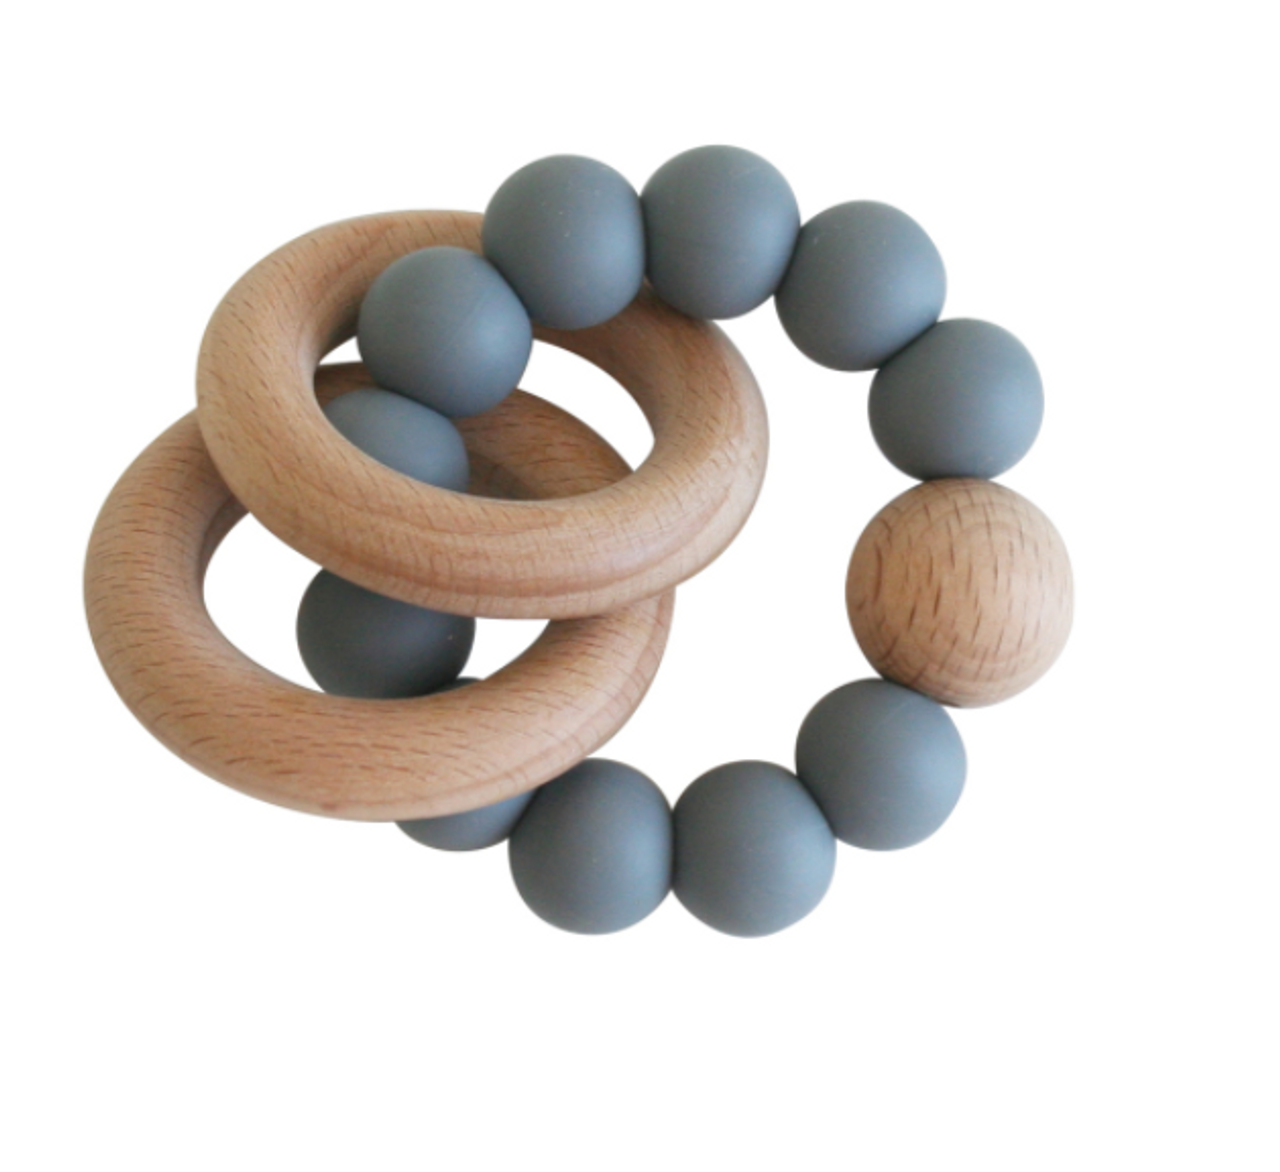 Beechwood Teether Ring Set - Storm Grey